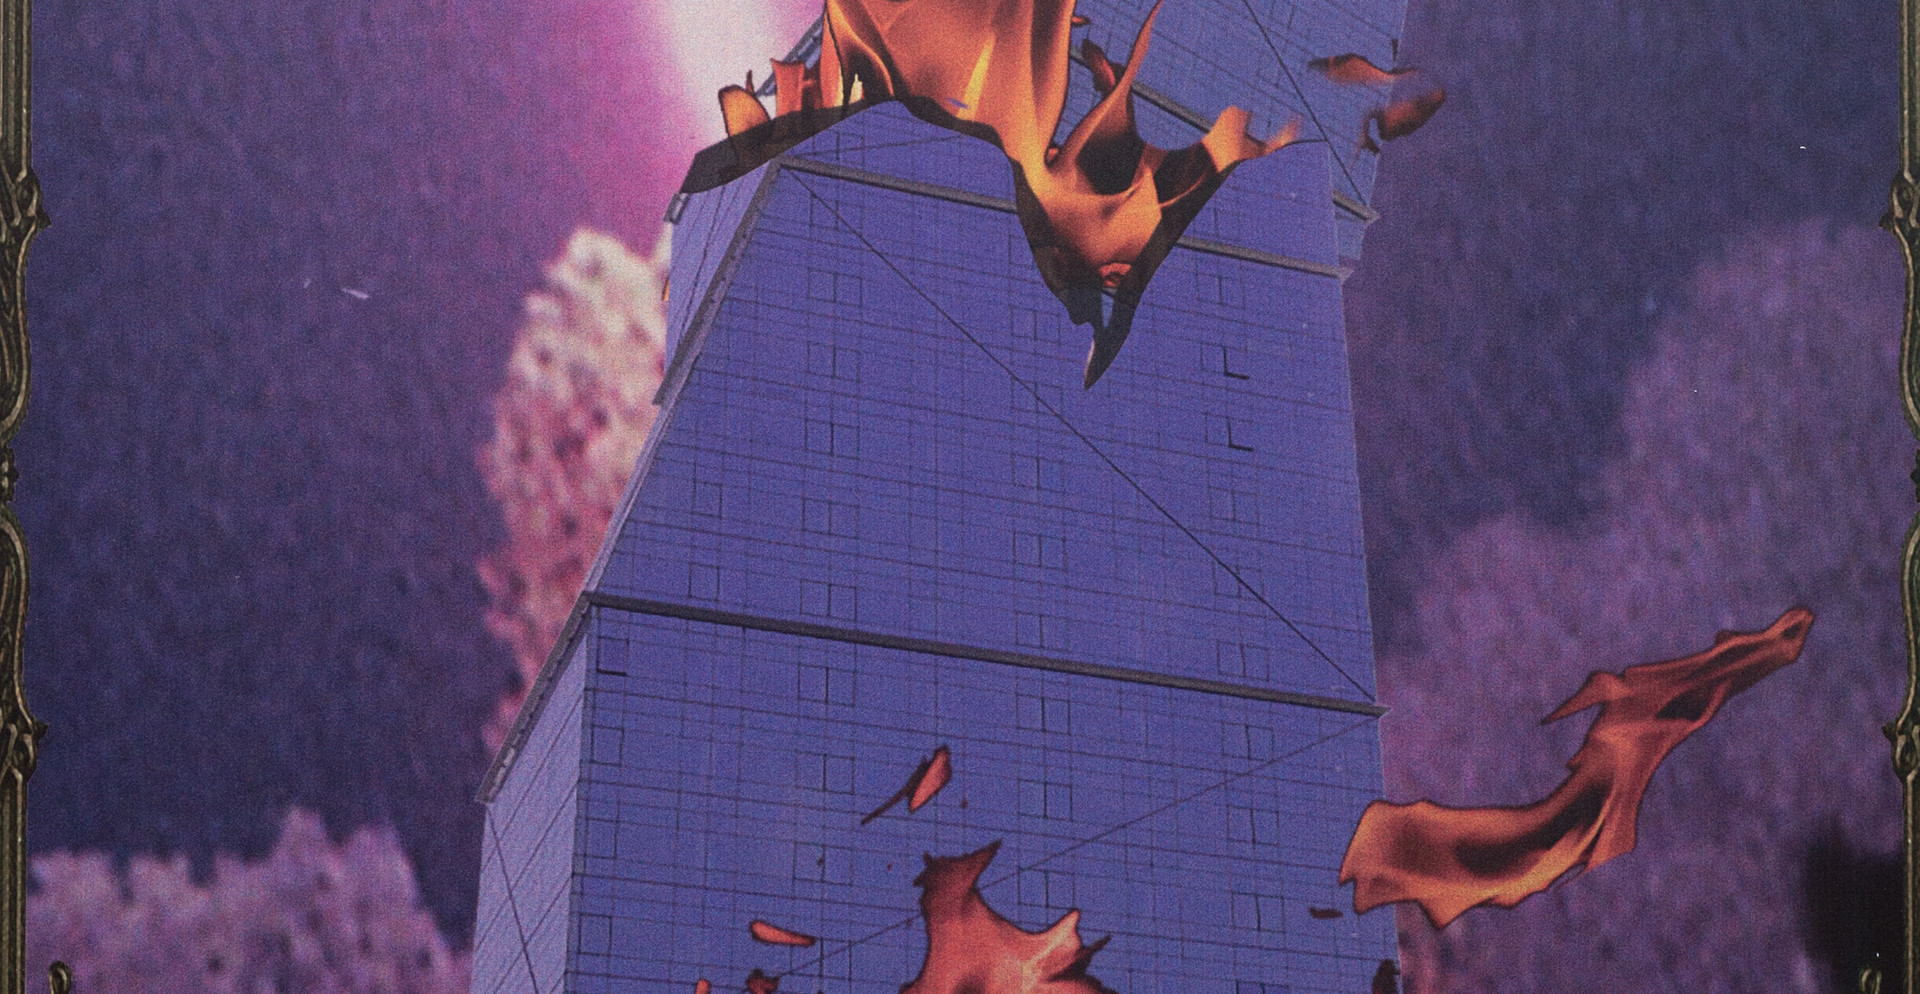 The Last tarot - The Tower